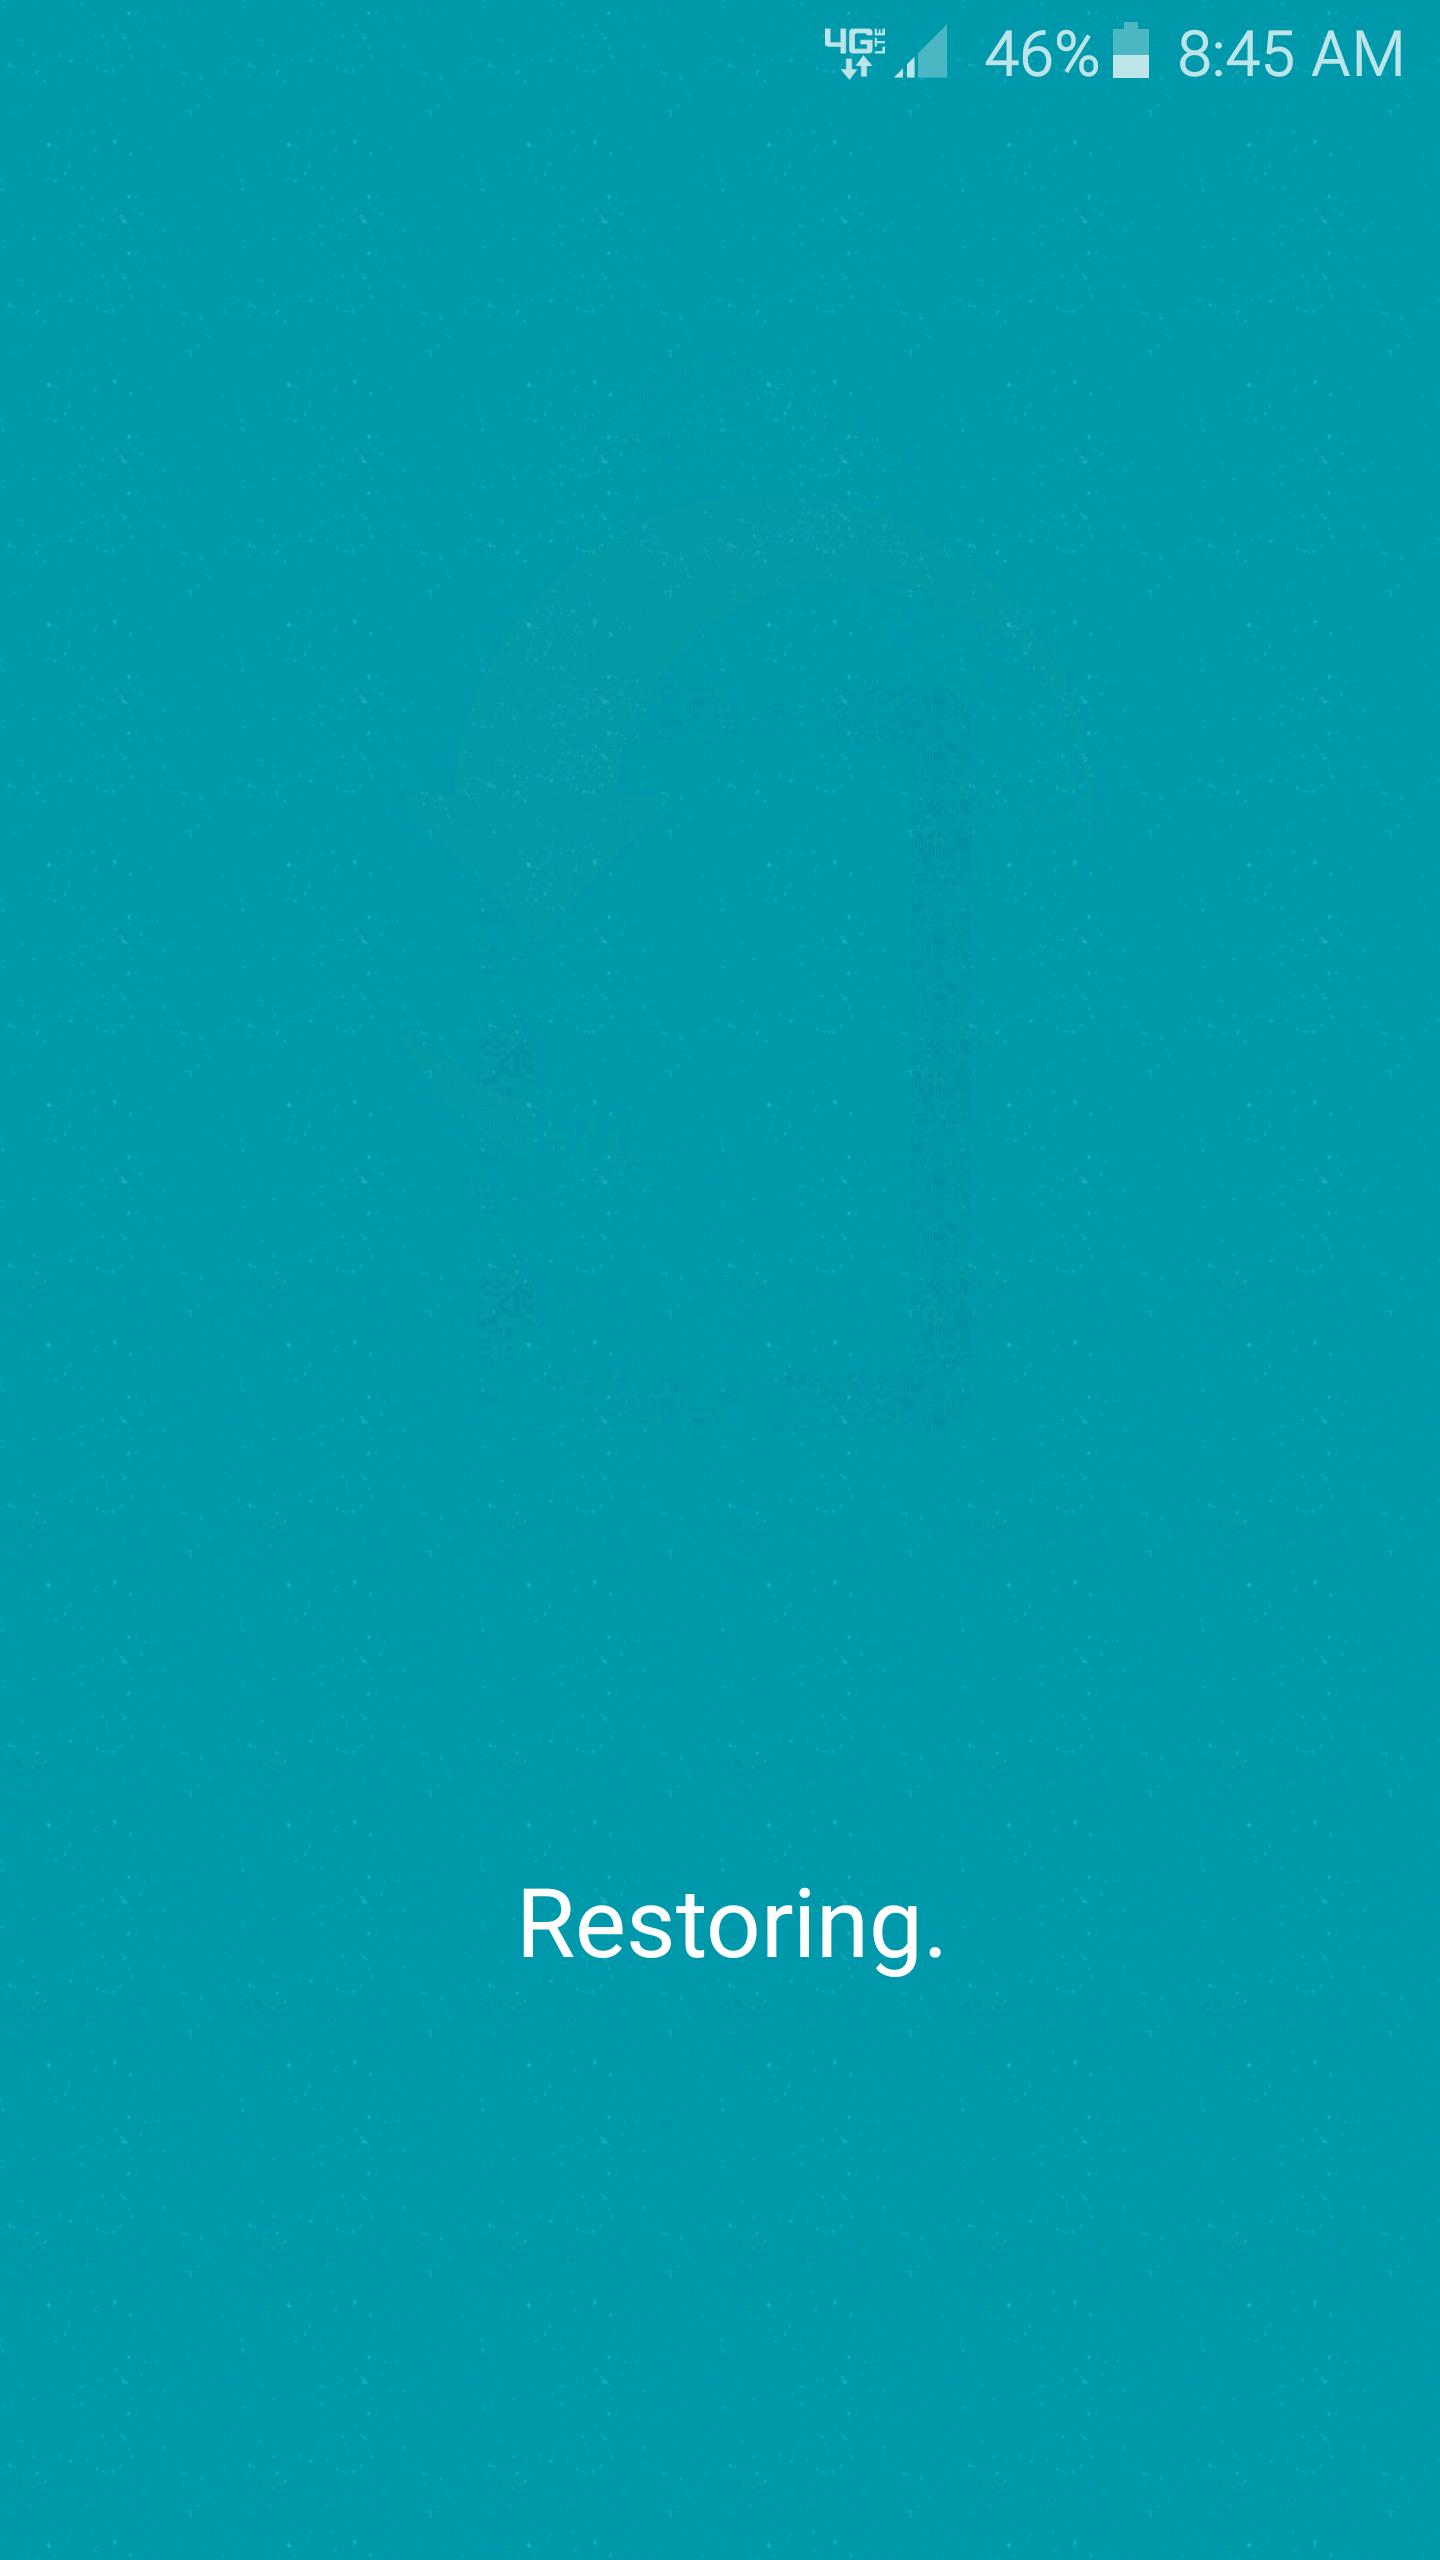 2015 04 30 12.45.46